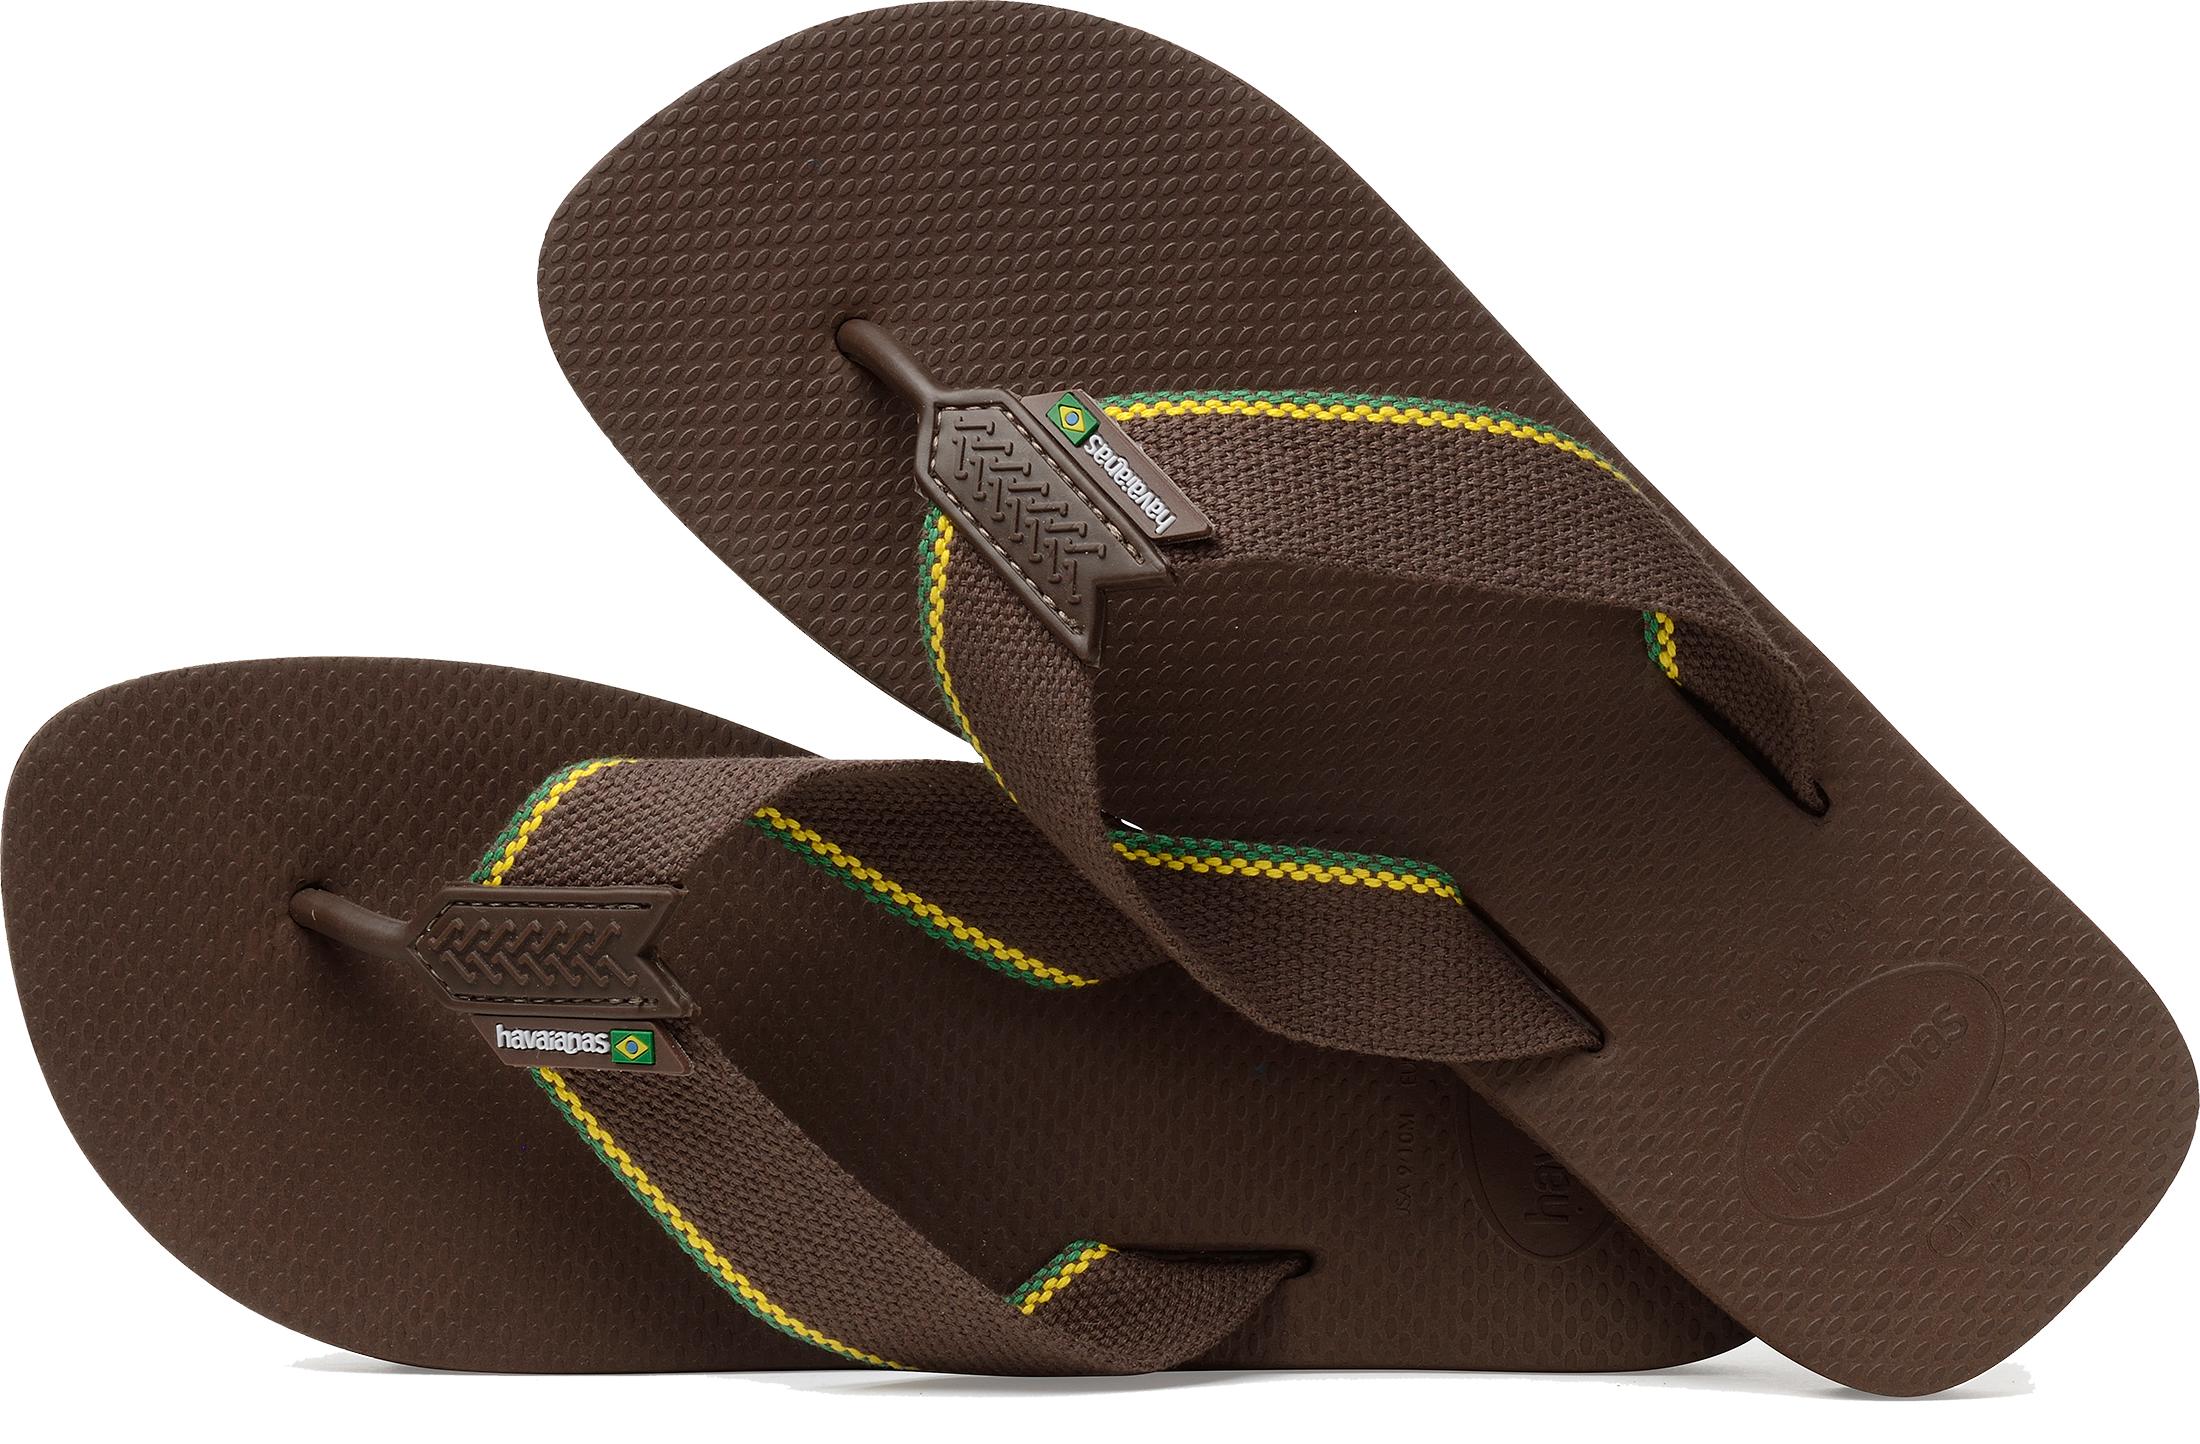 955934ea0d8c55 Havaianas Men s Urban Brazil Flip Flops Uk8 Dark Brown Hv18 ...